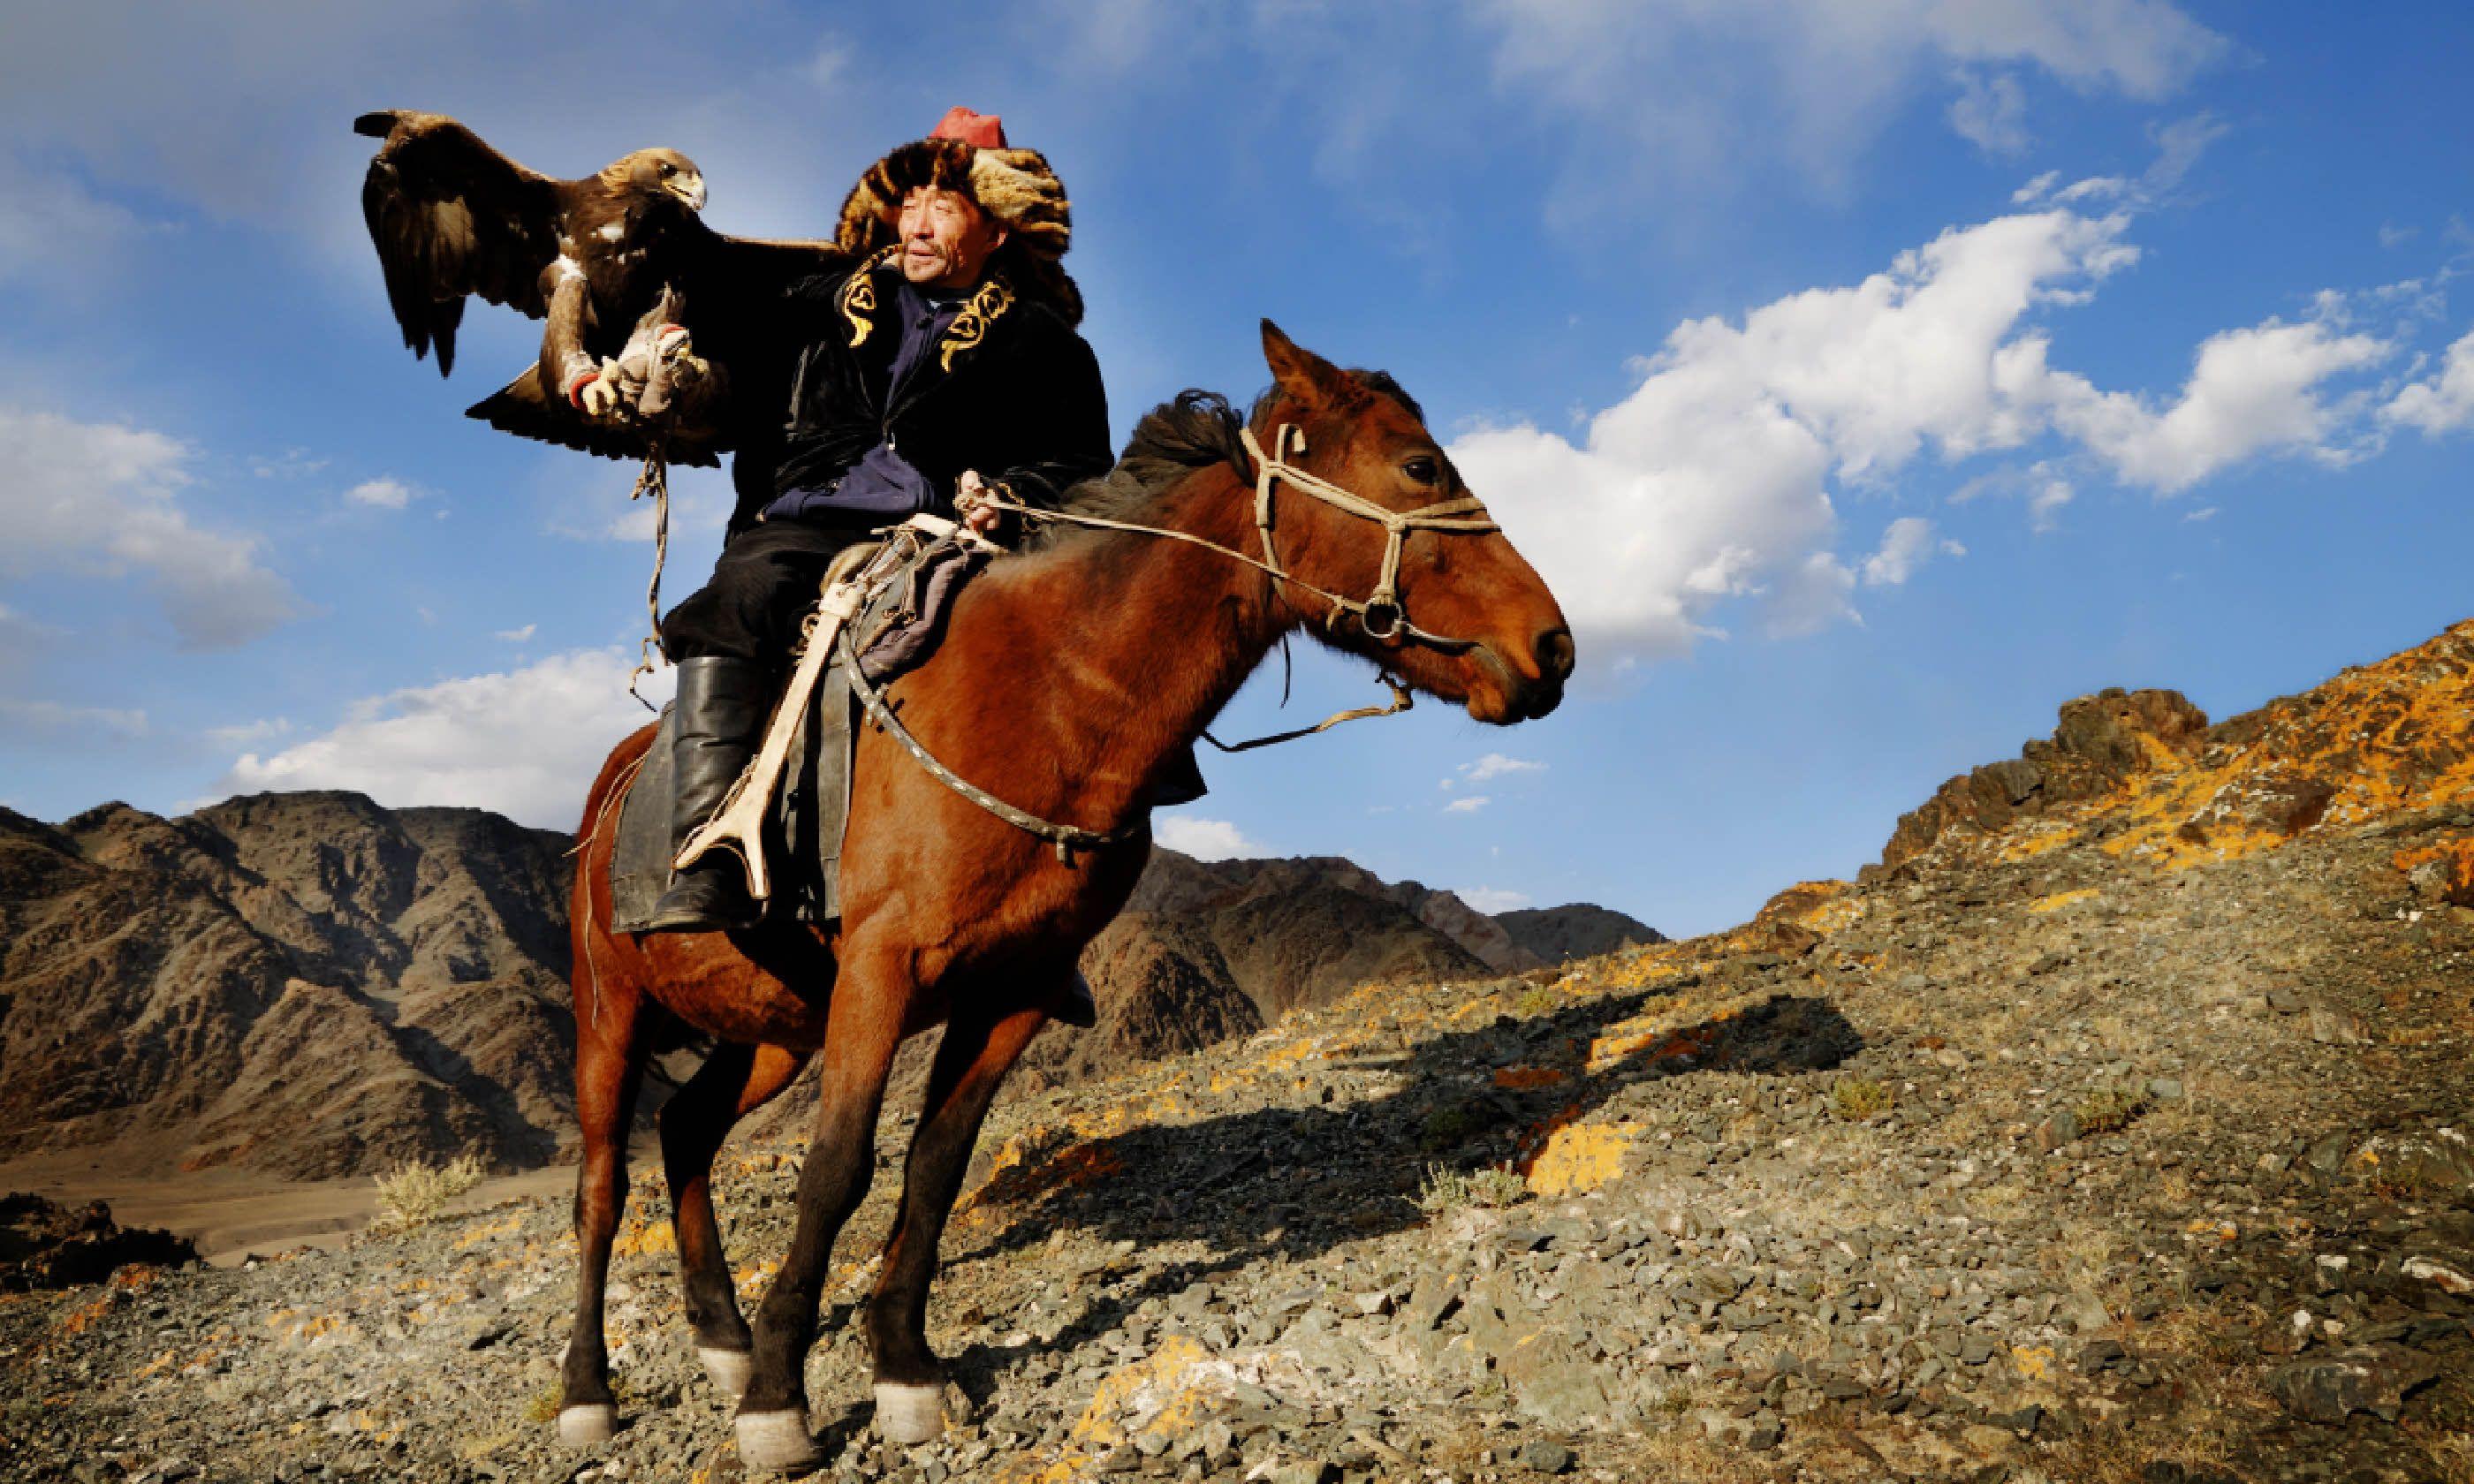 Kazakh men, Western Mongolia (Shutterstock)